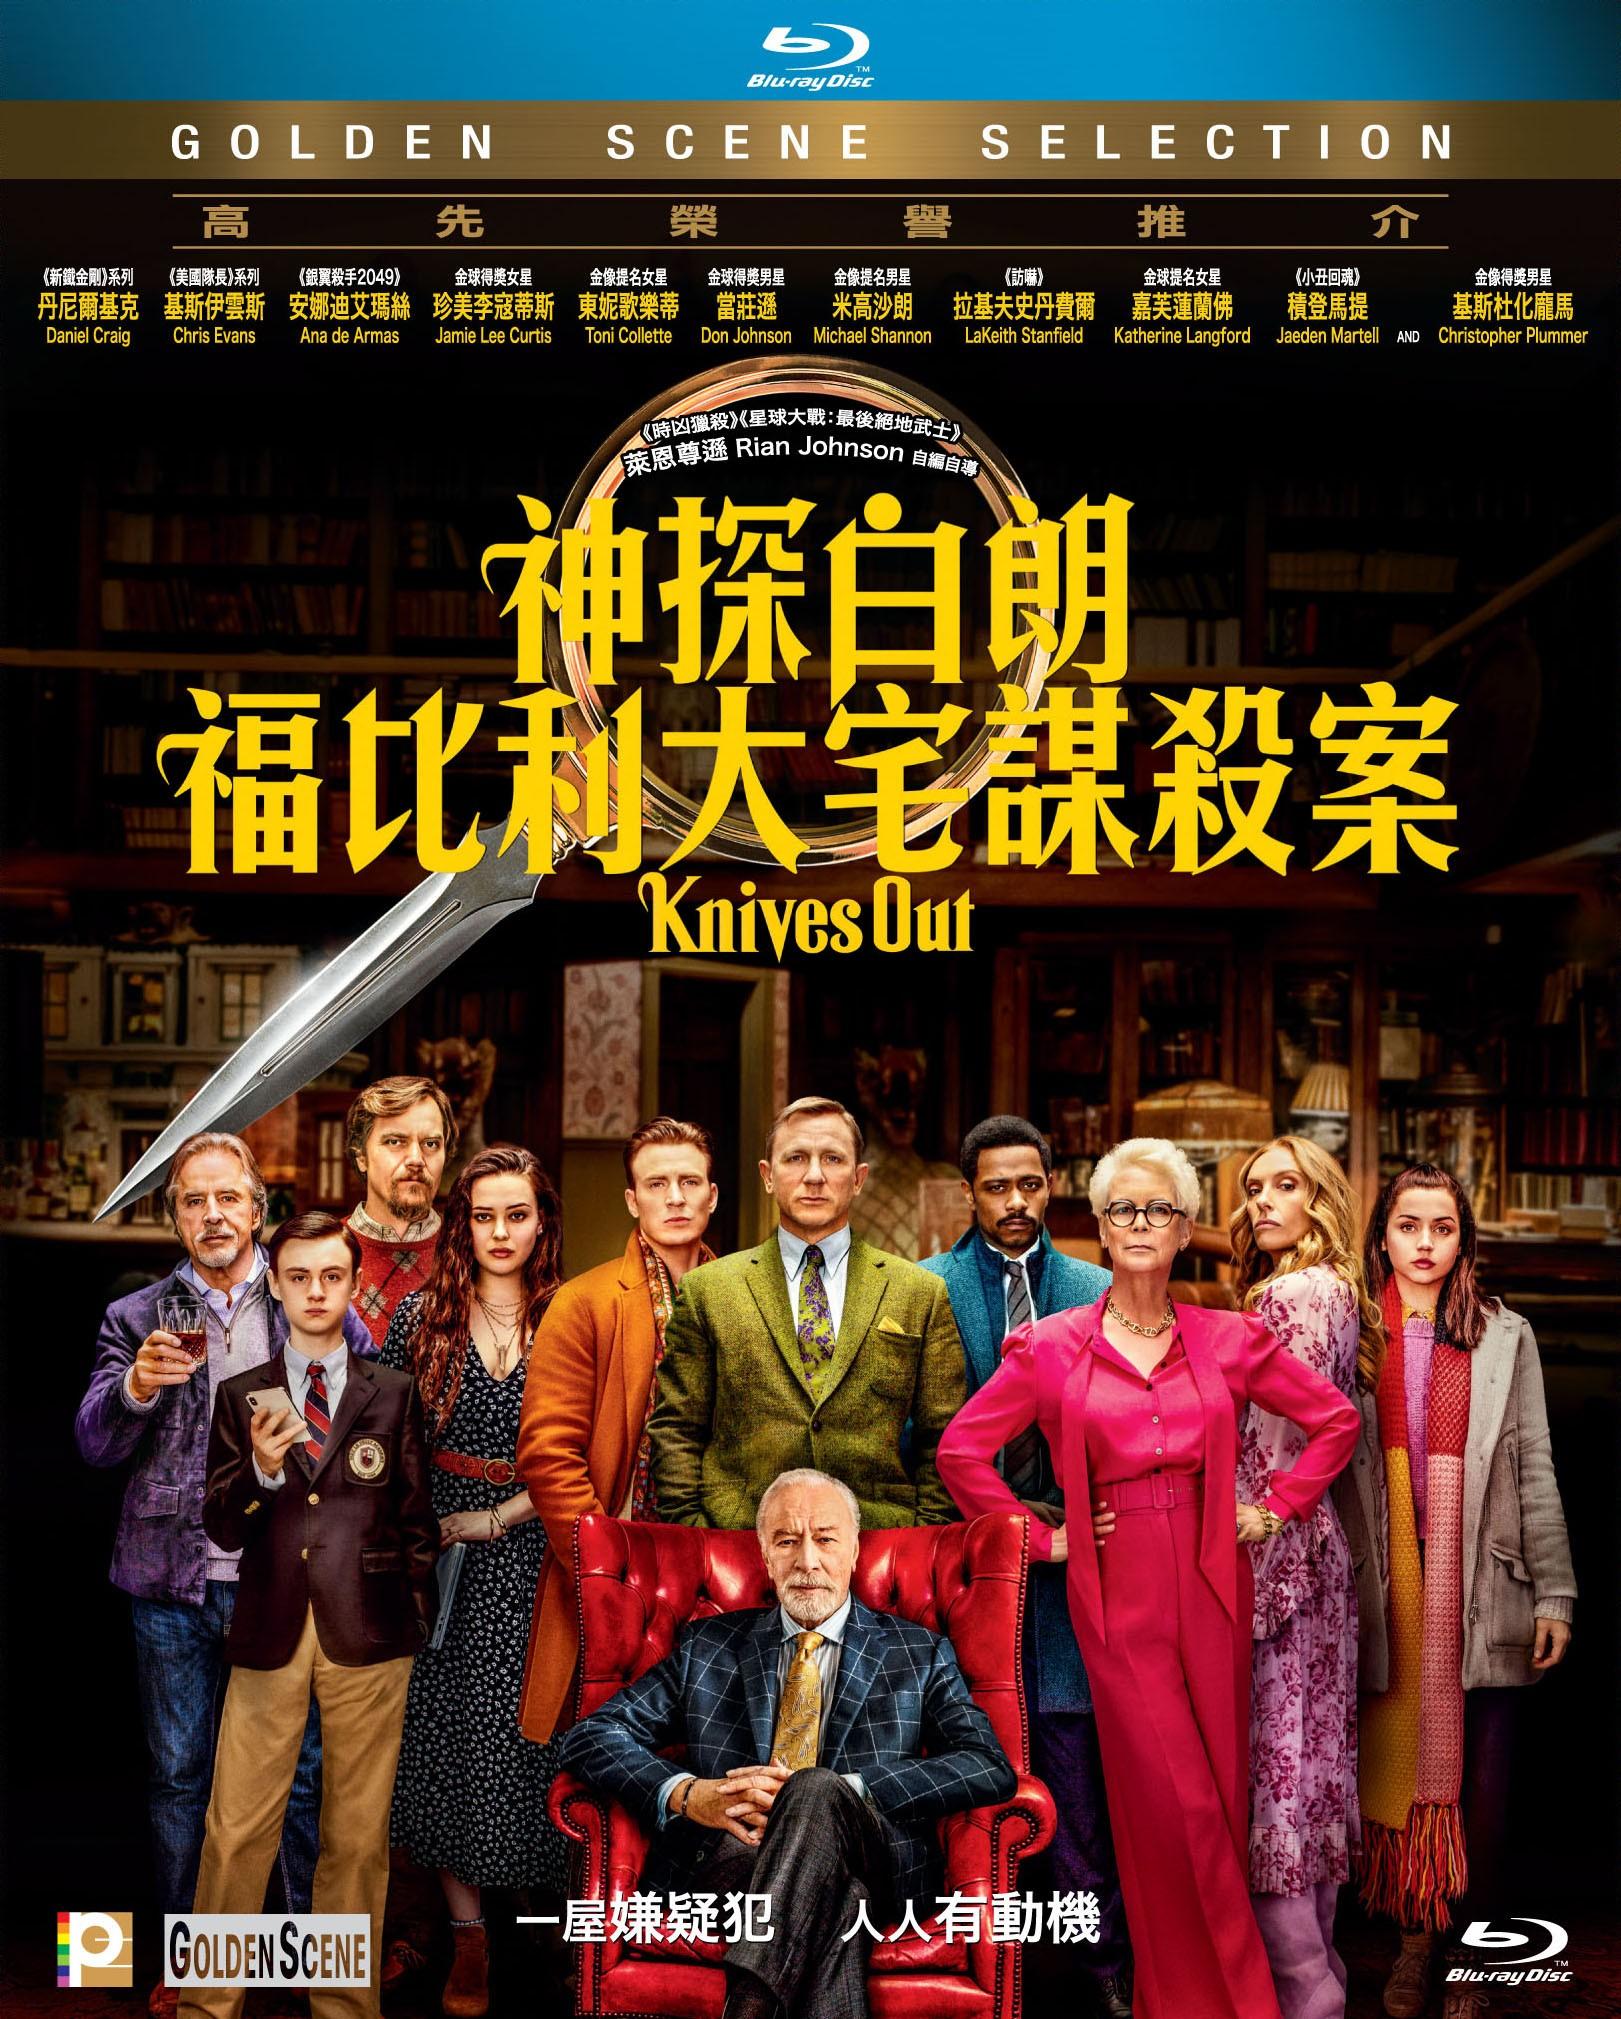 https://shop.panorama.com.hk/hk/drama/3366--4.html